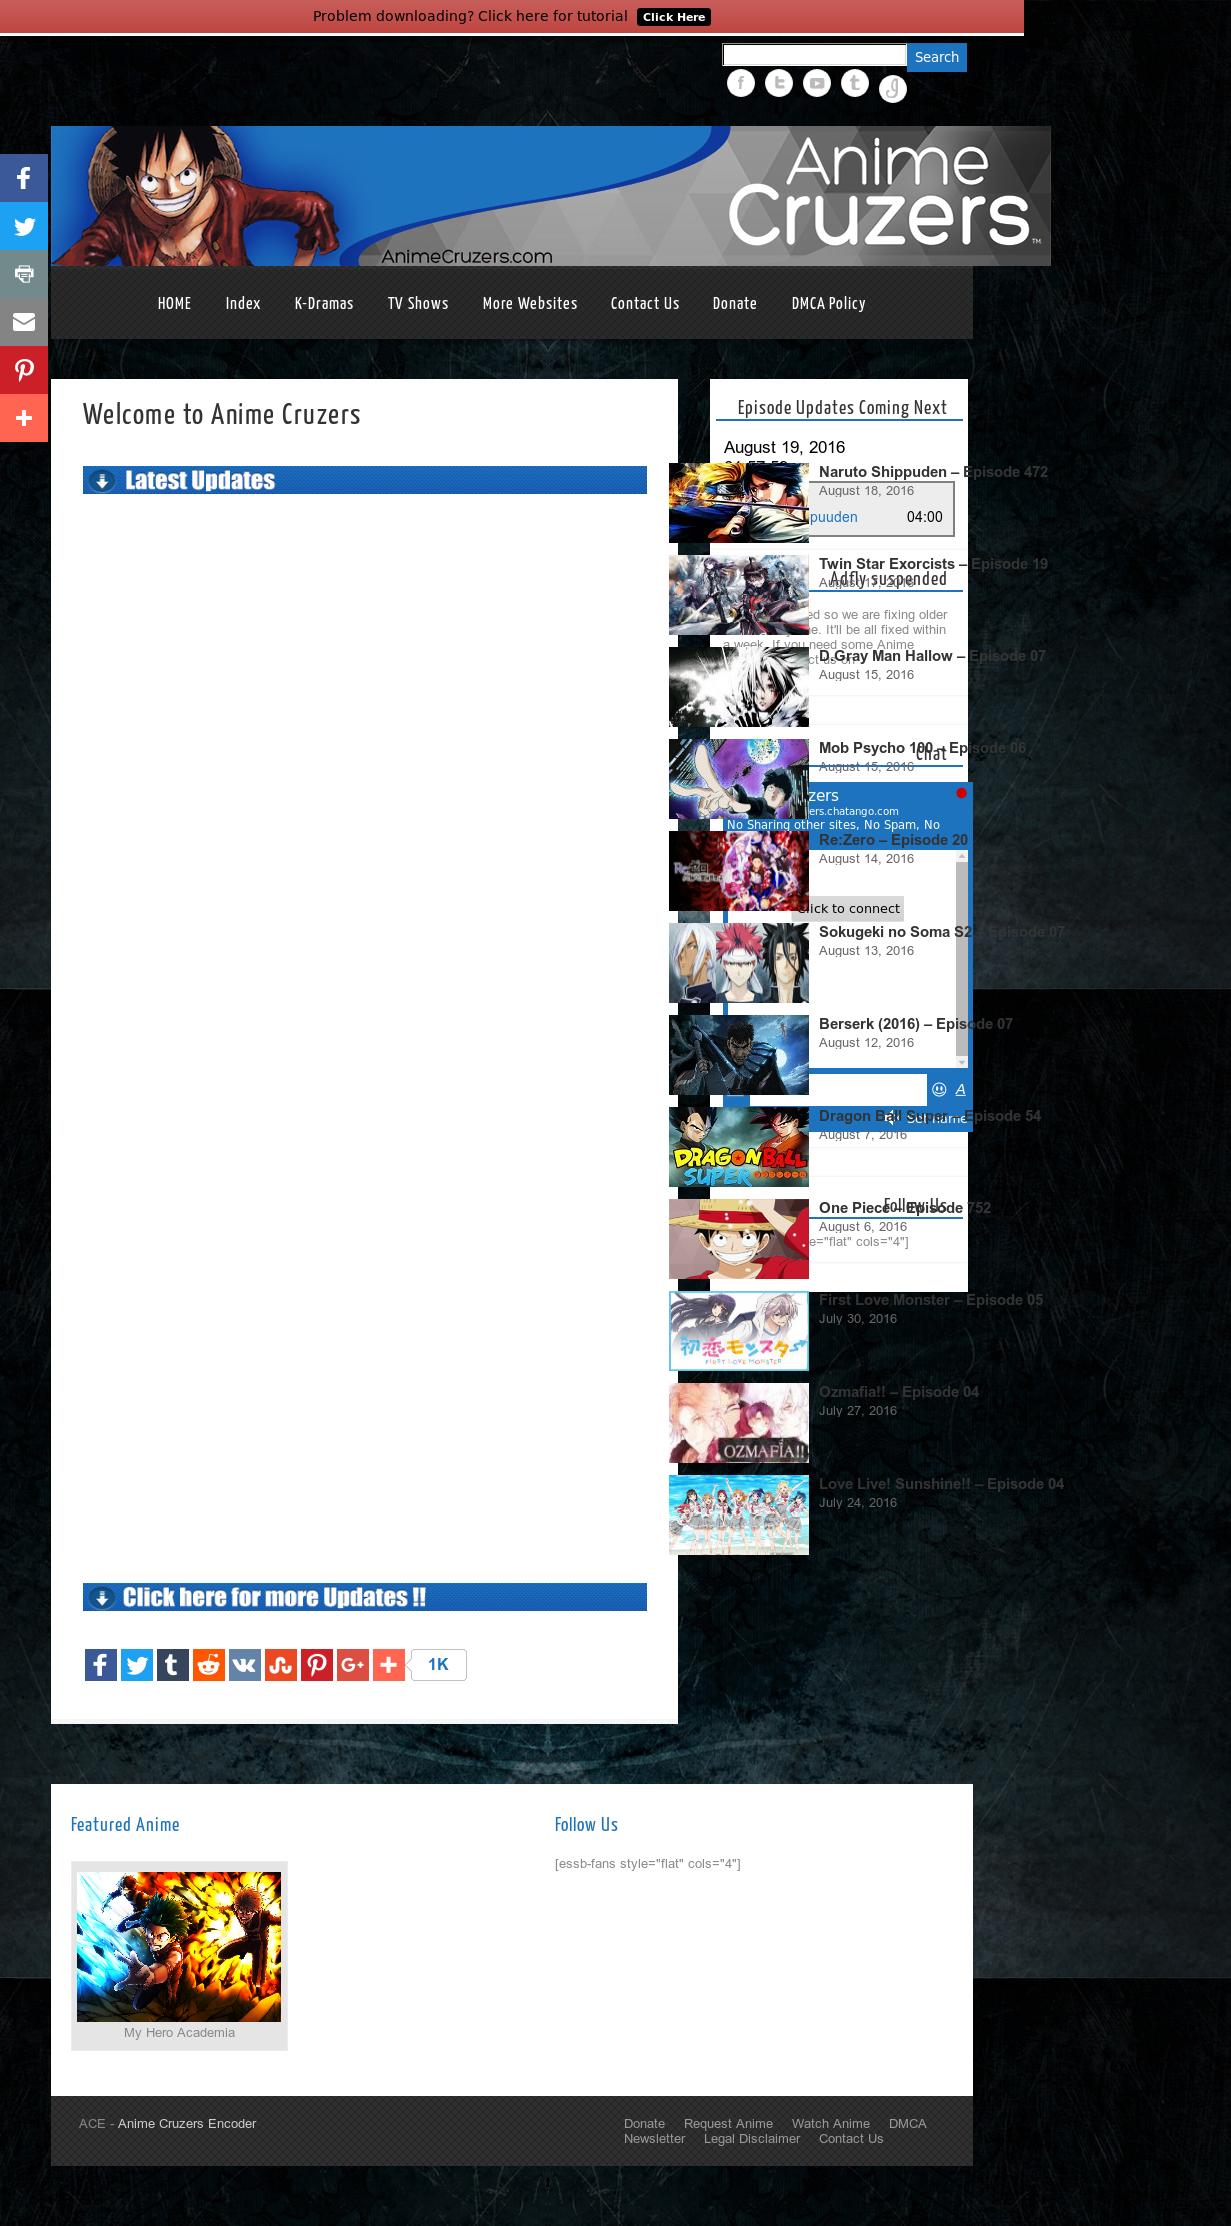 Animecruzers Competitors, Revenue and Employees - Owler